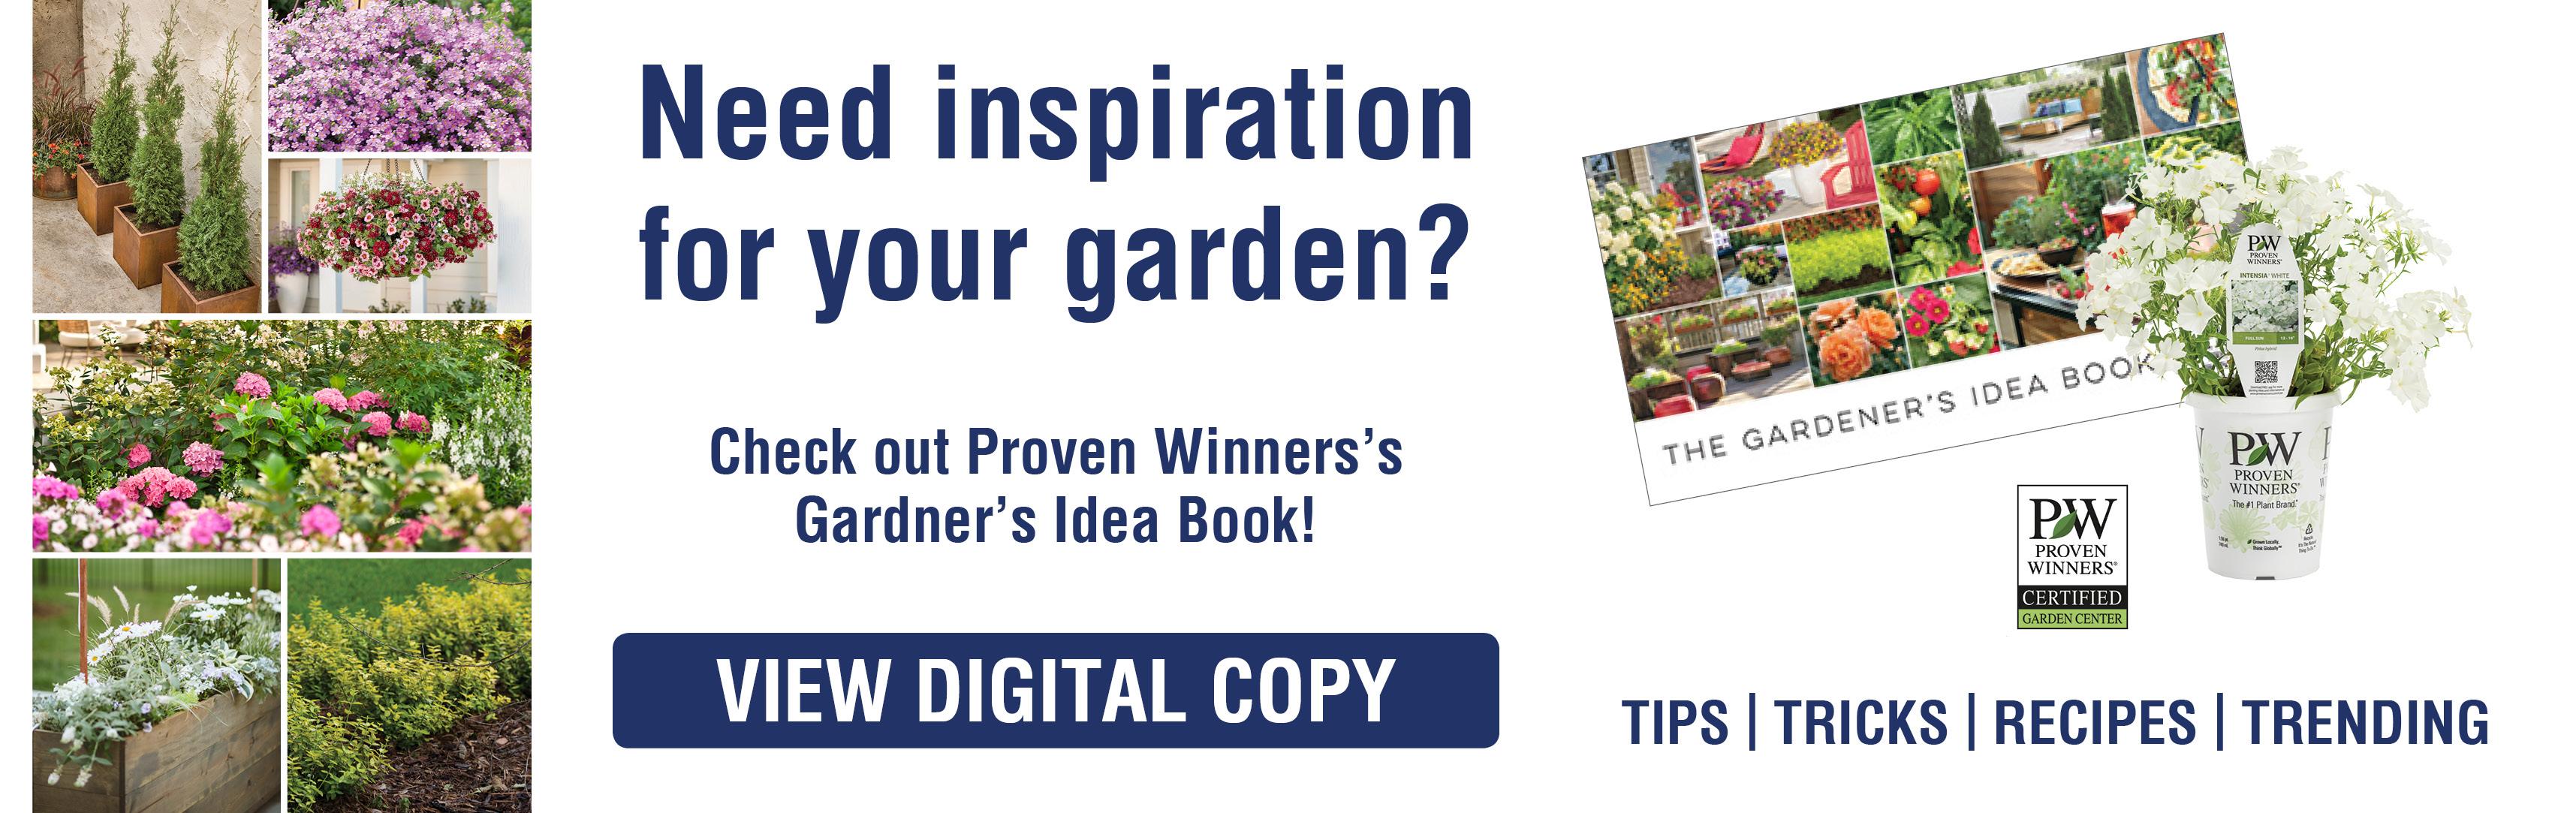 June-2019-Flyer-Slider-GARDNER-IDEA-BOOK10-2